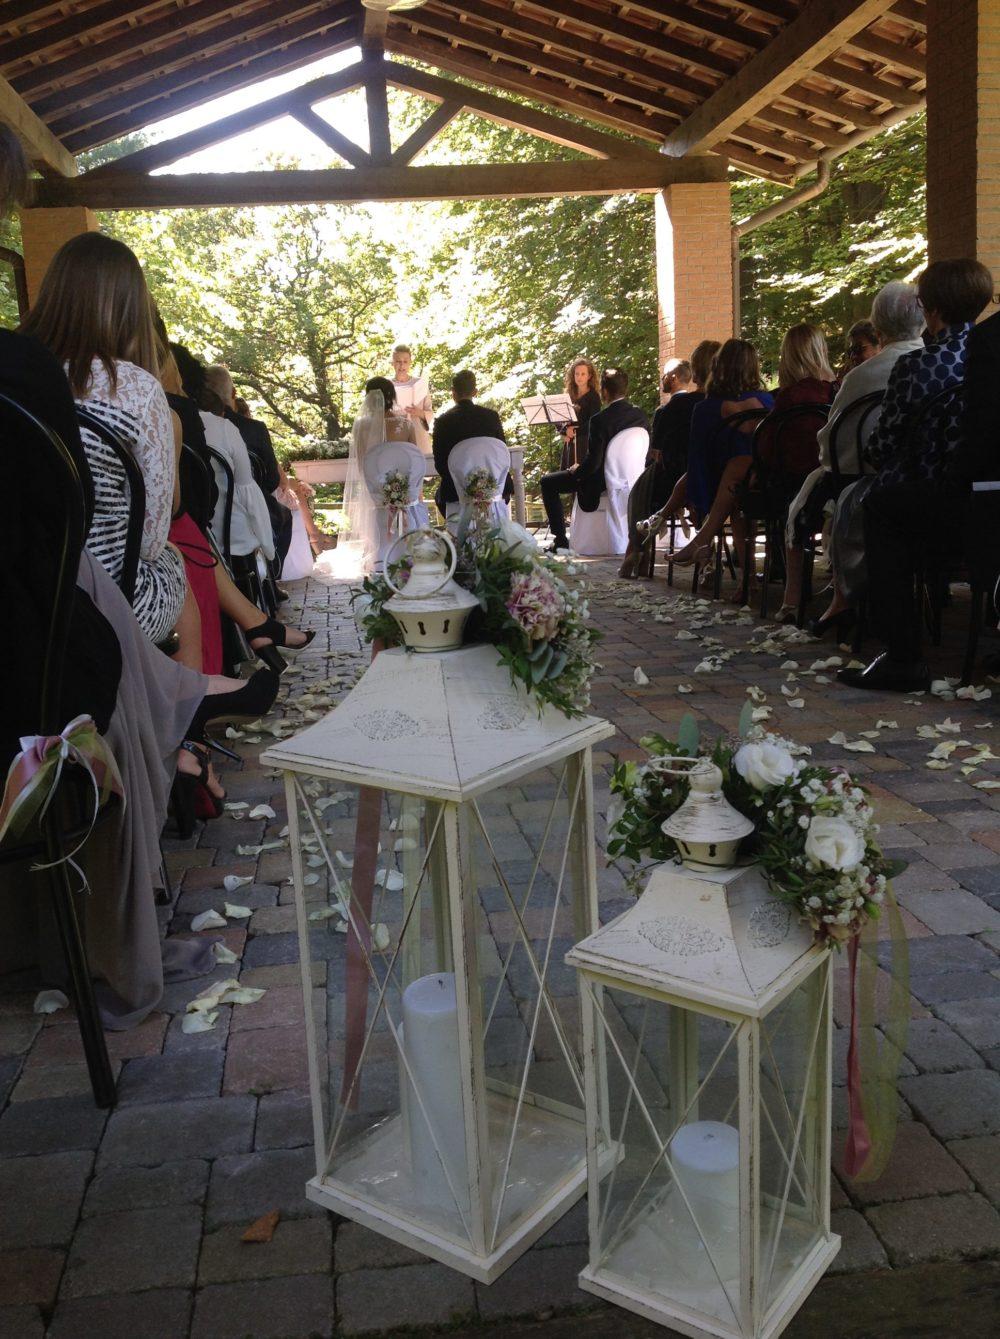 Diodona - cerimonia nozze